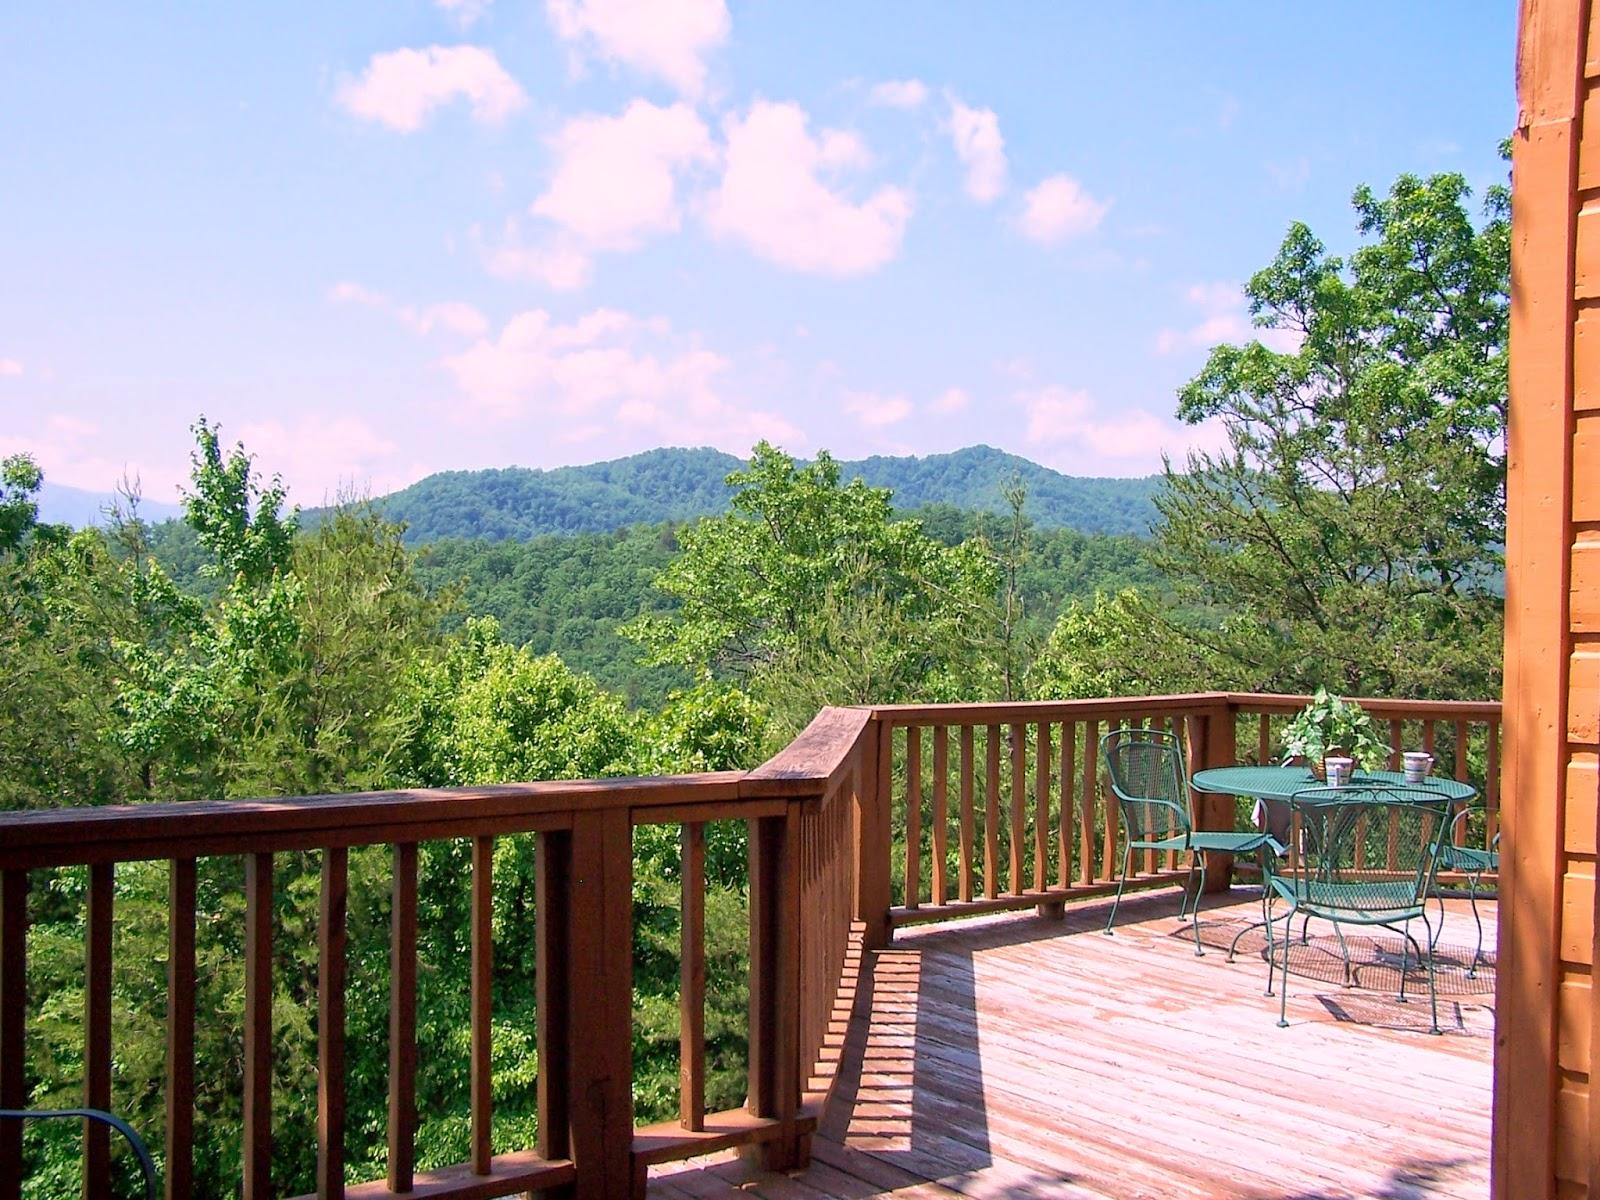 Heavenly cabins smoky mountain cabin rentals smoky for Smoky mountain cabins with fishing ponds